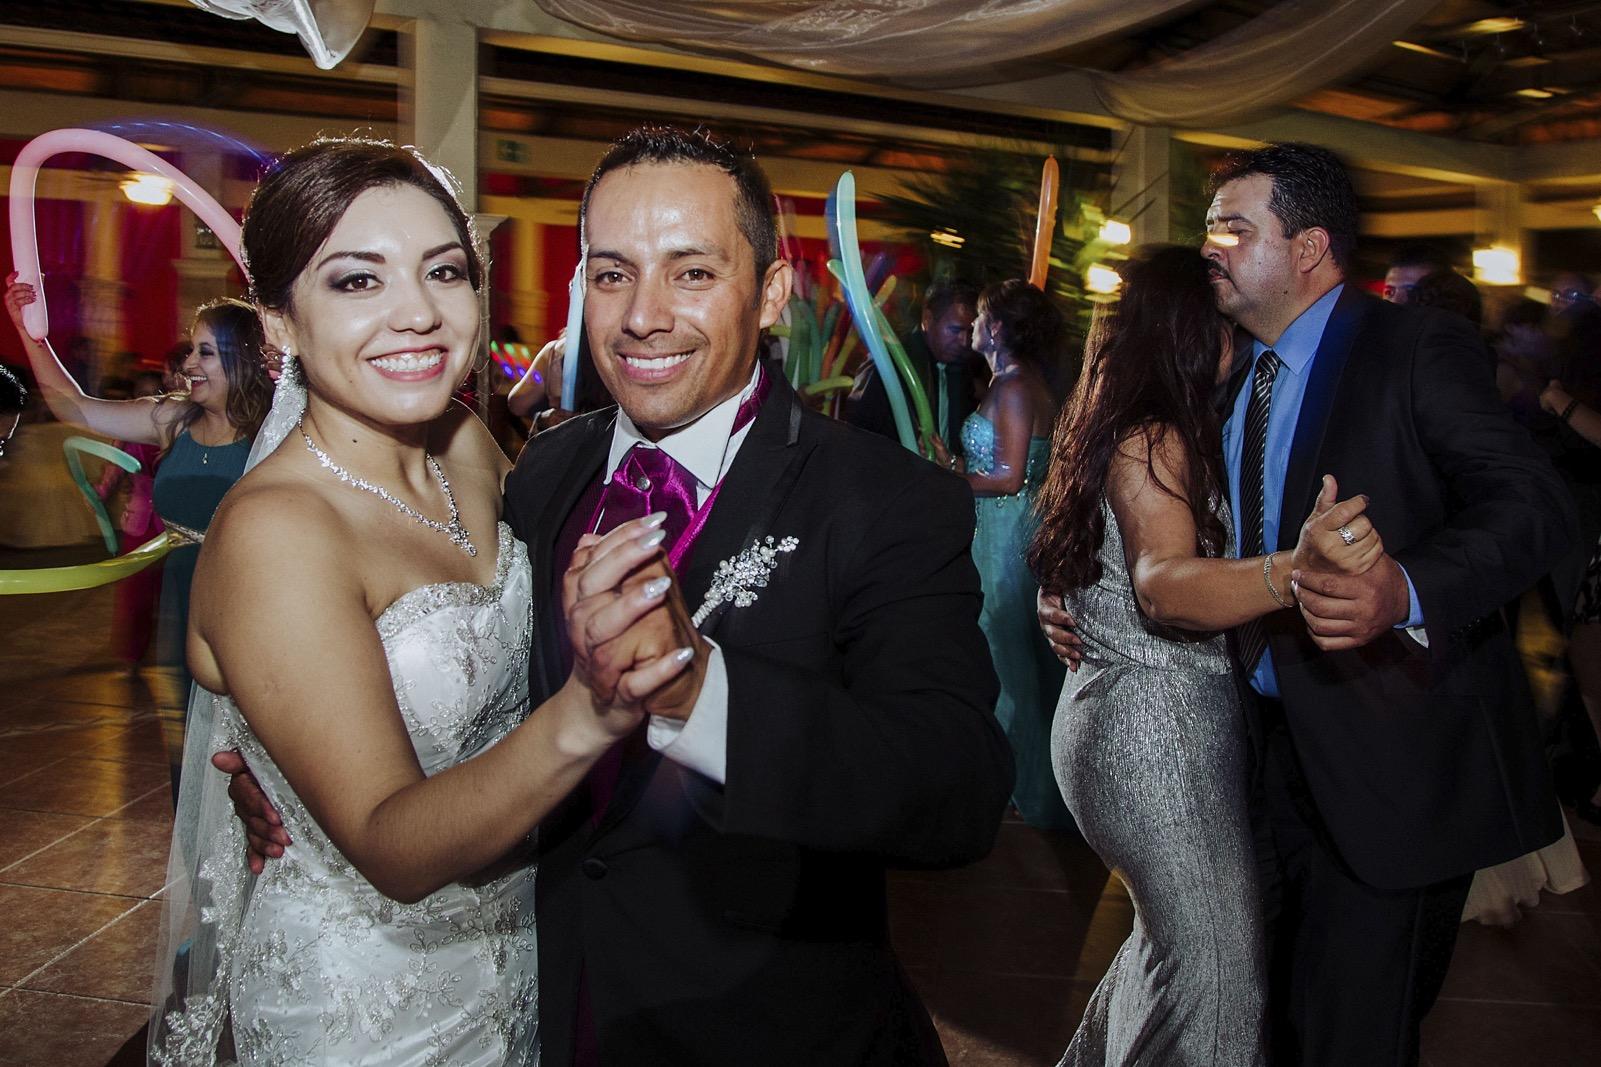 fotografo_profesional_bodas_xv_chihuahua_zacatecas_mexico-54